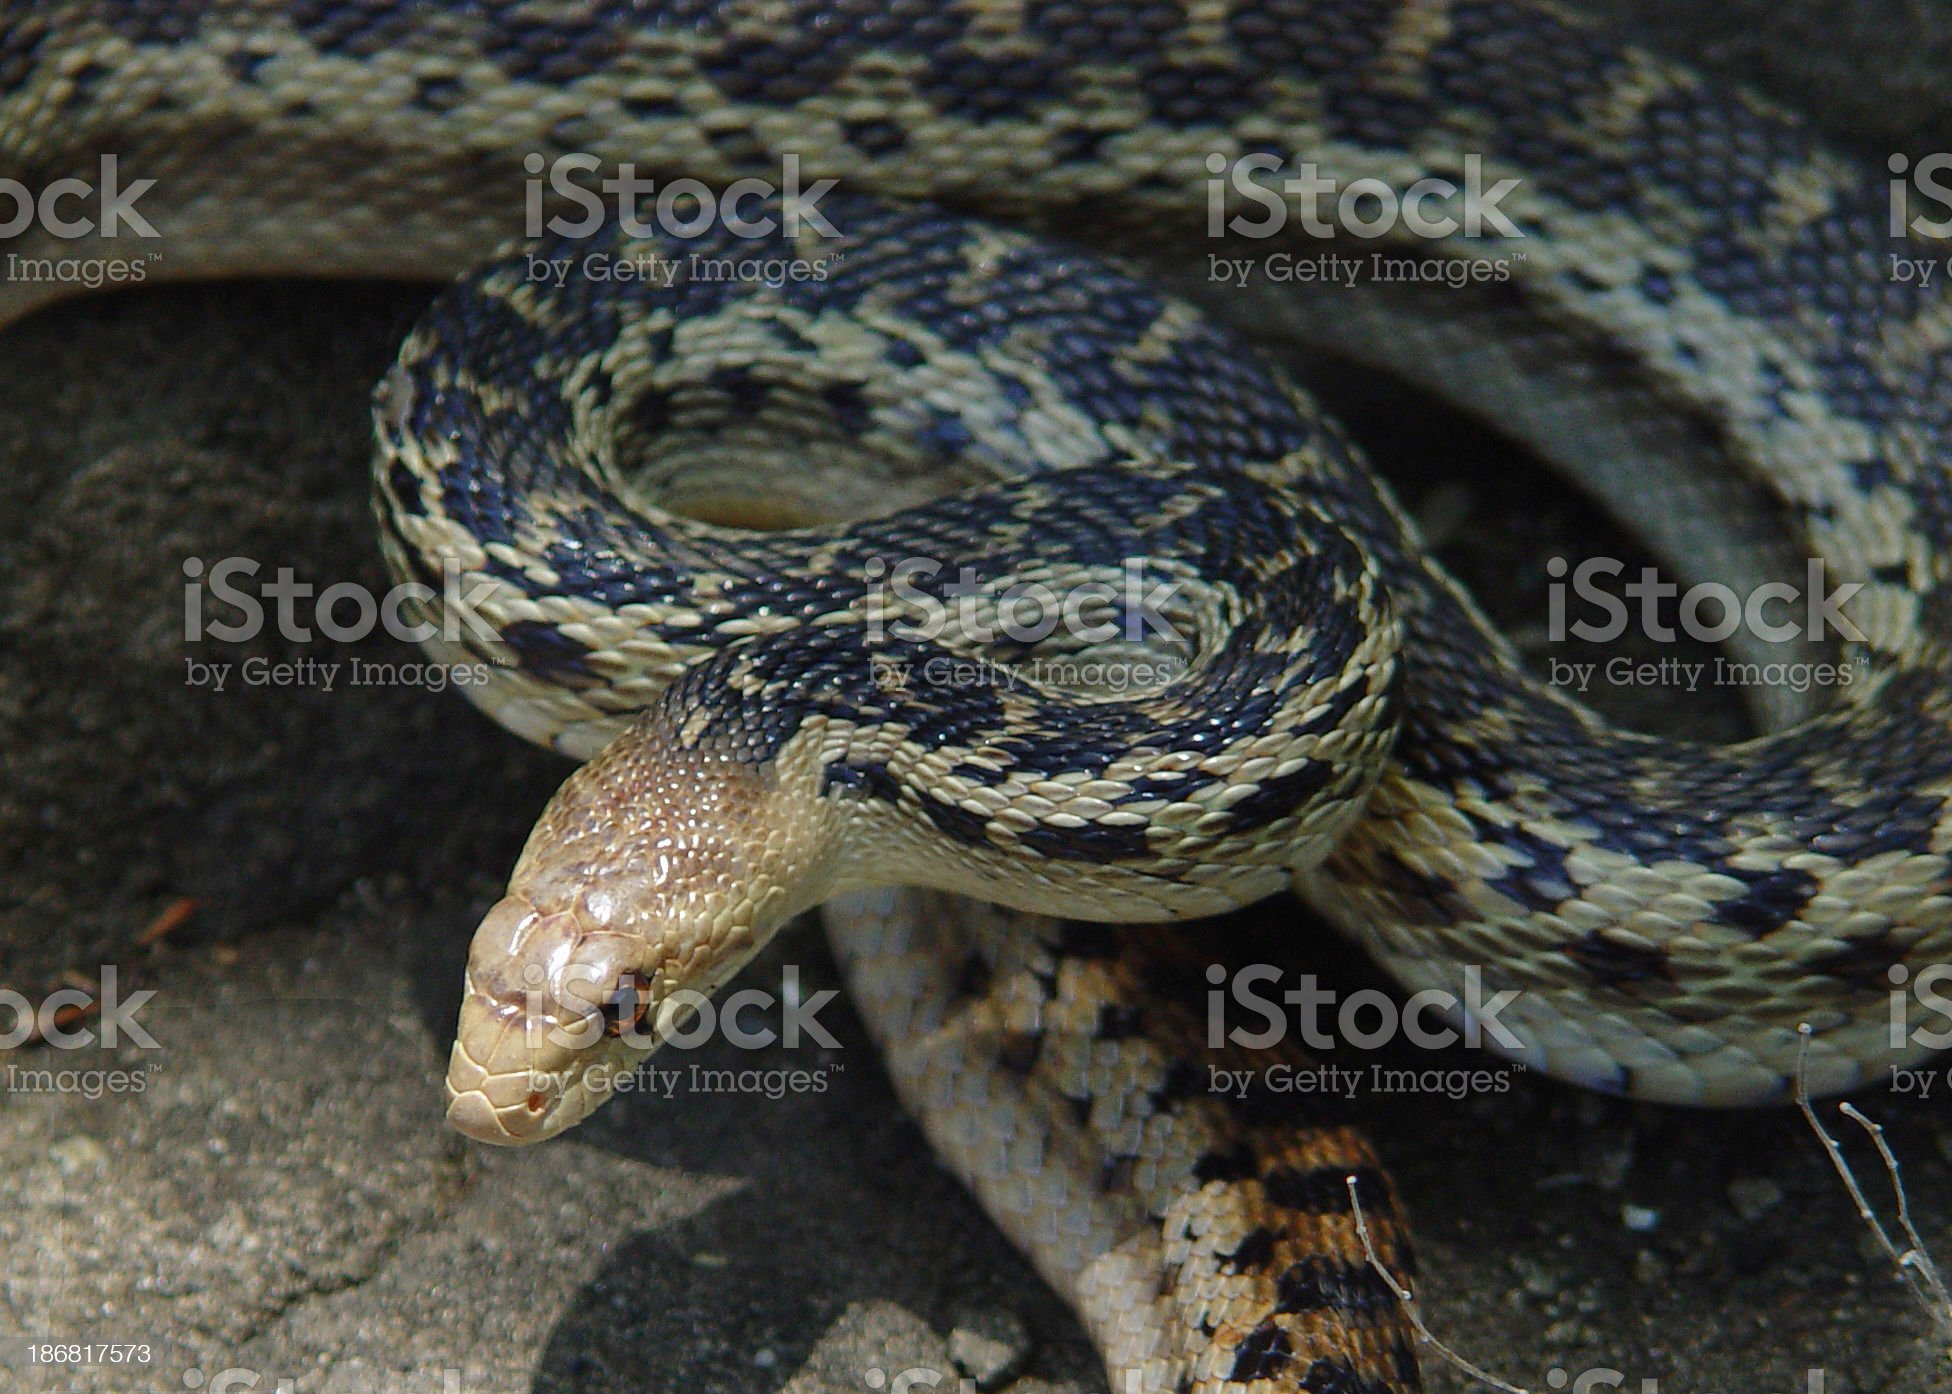 Gopher snake royalty-free stock photo